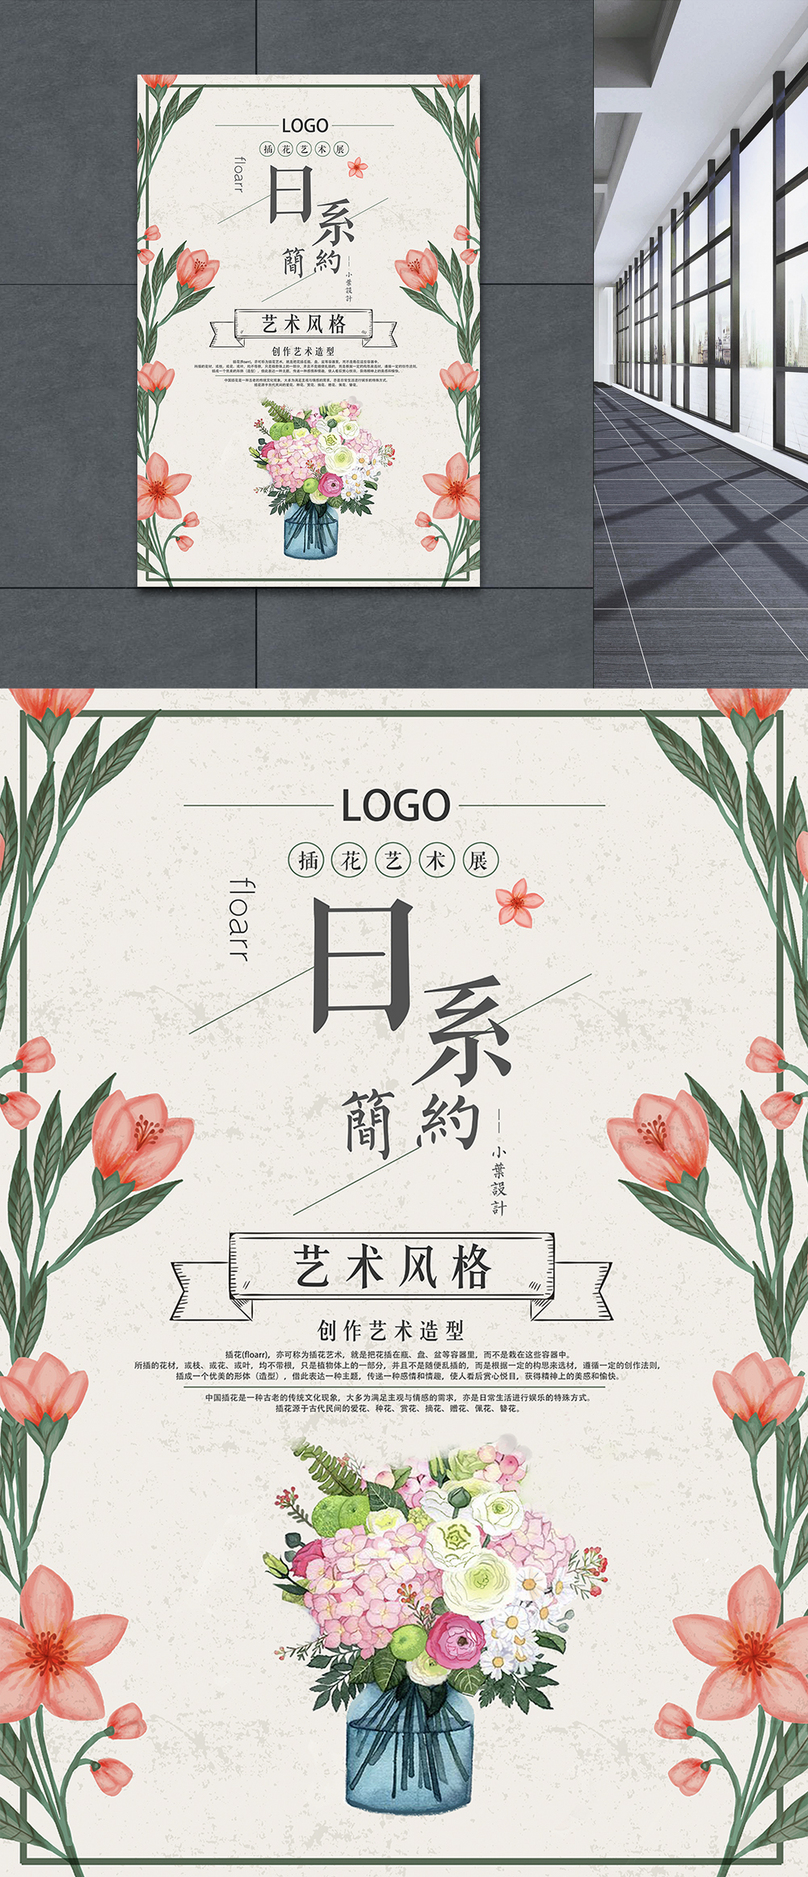 Cartel Simple Japonés Del Arte Del Arreglo Floral Imagen